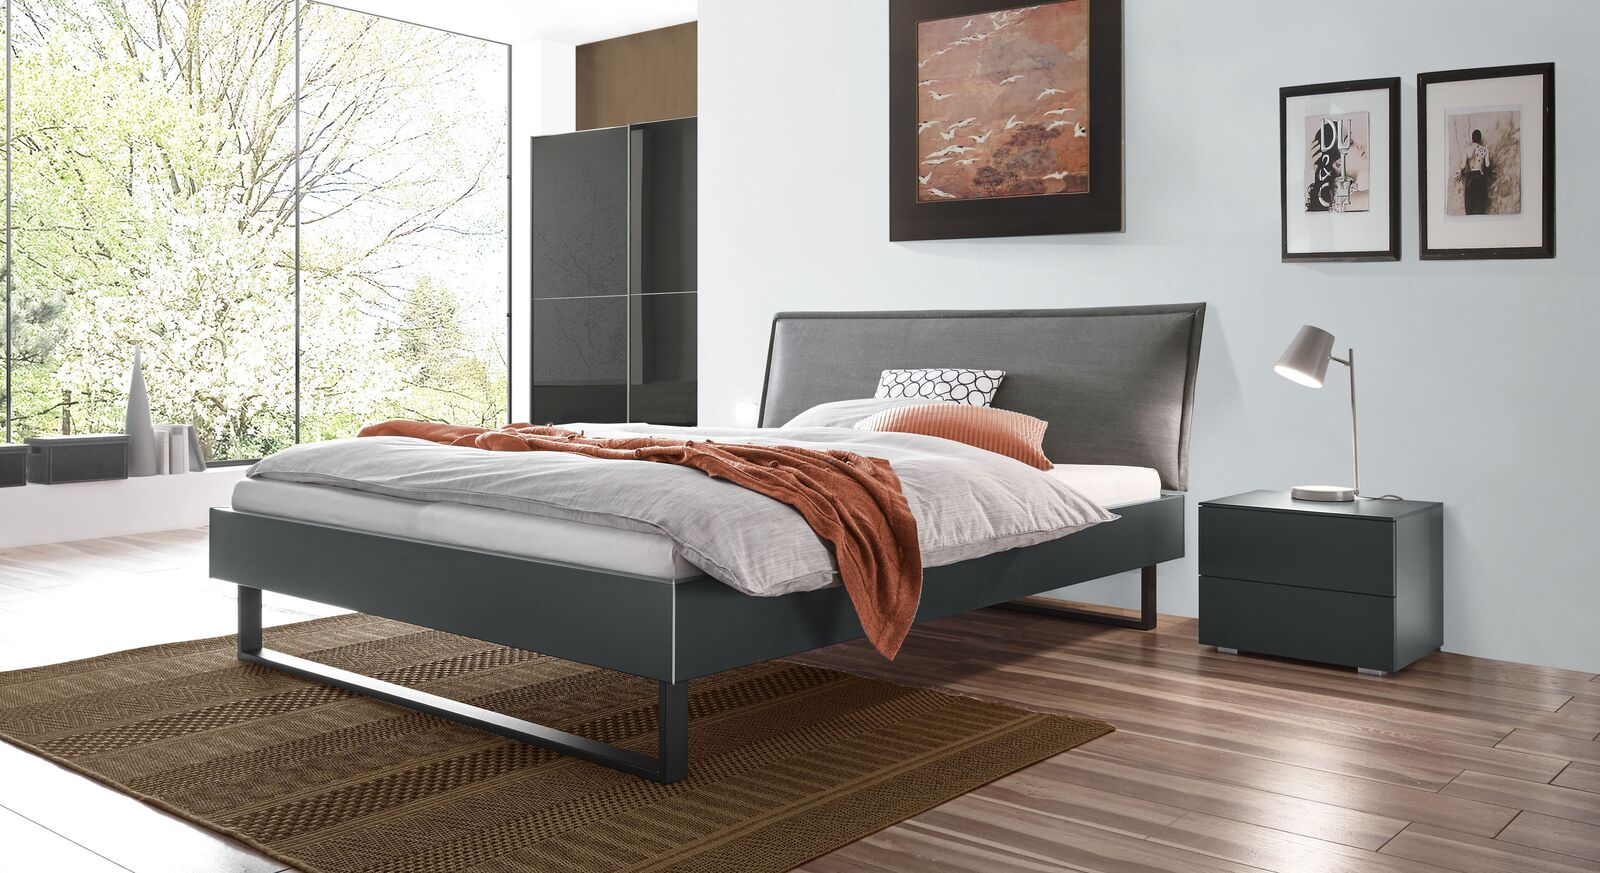 Komplett-Schlafzimmer Kumari in stilvollen Grautönen